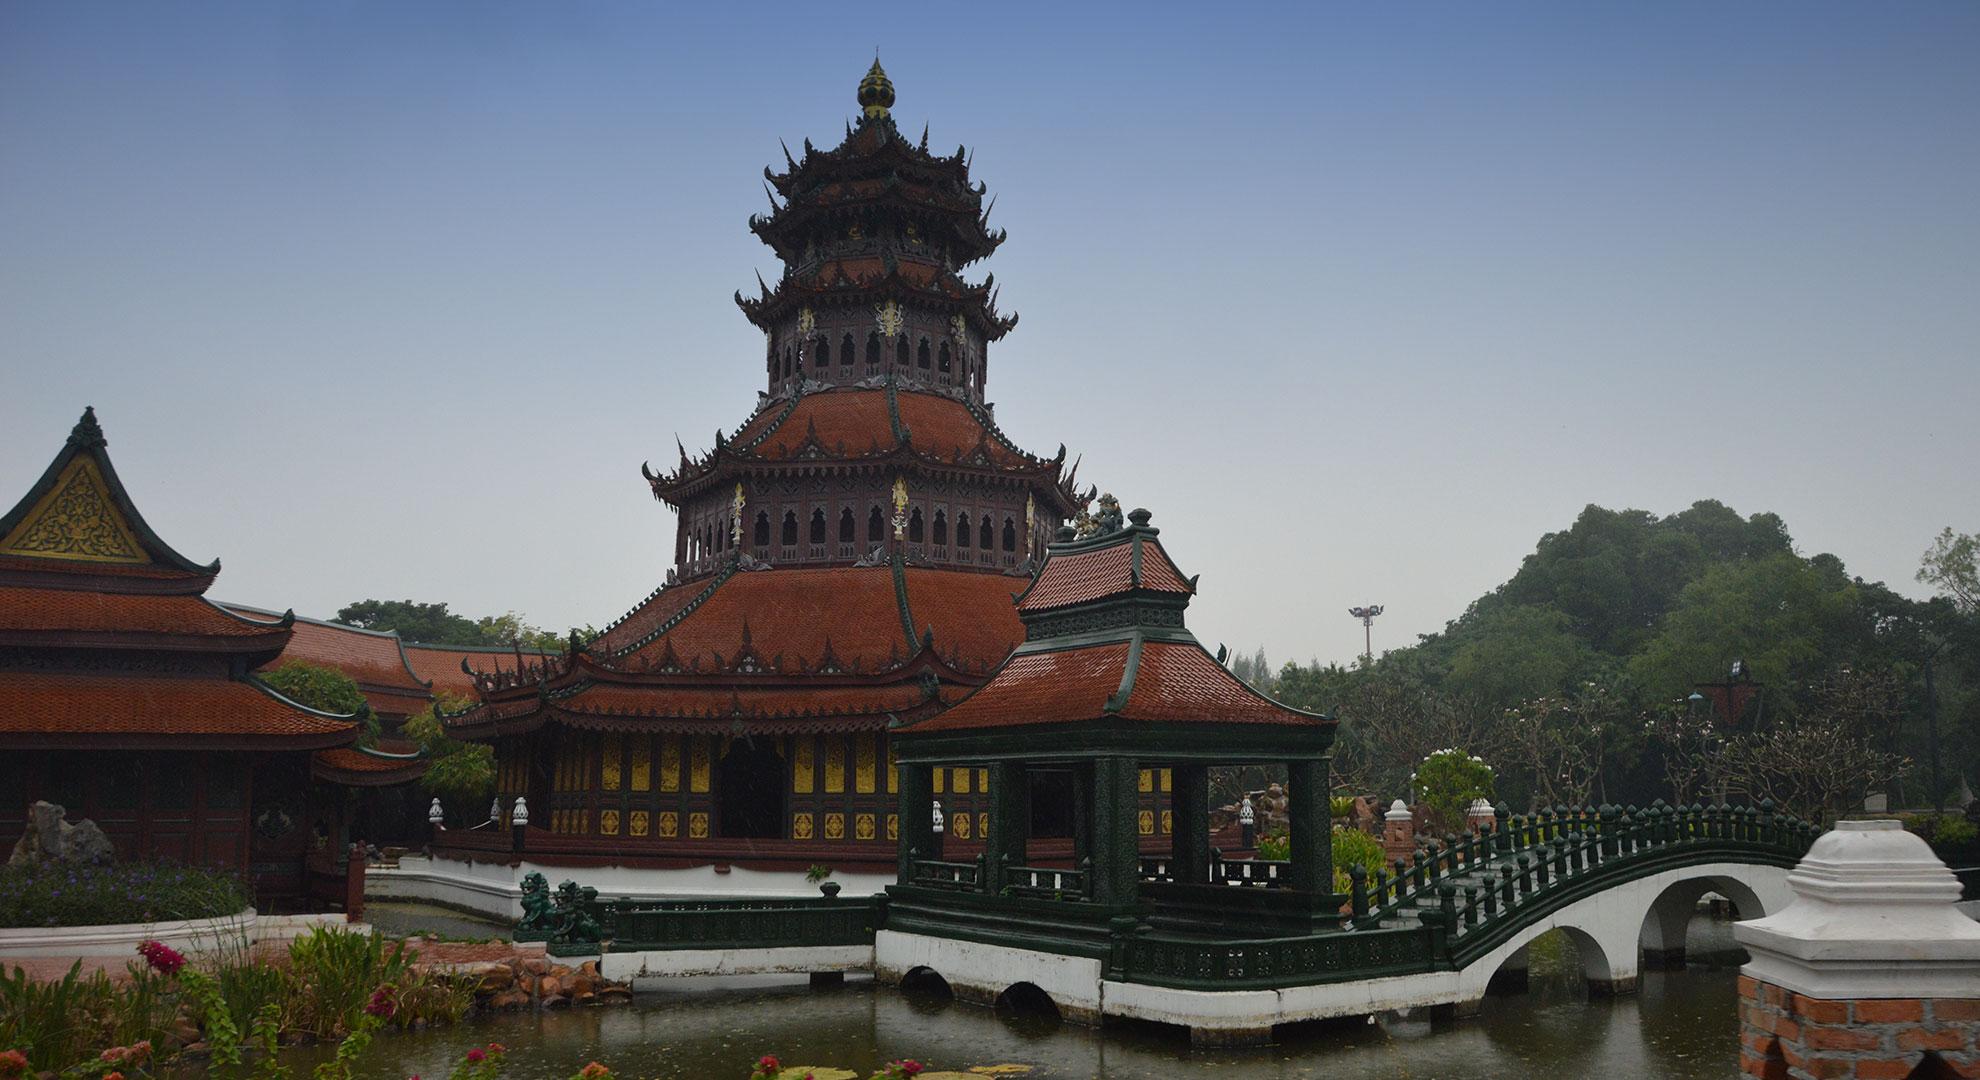 Bangkok-Tipps für Skeptiker | Ancient City - Mueang Boran | www.dearlicious.com | Dear Nitjakan Bunbuamas